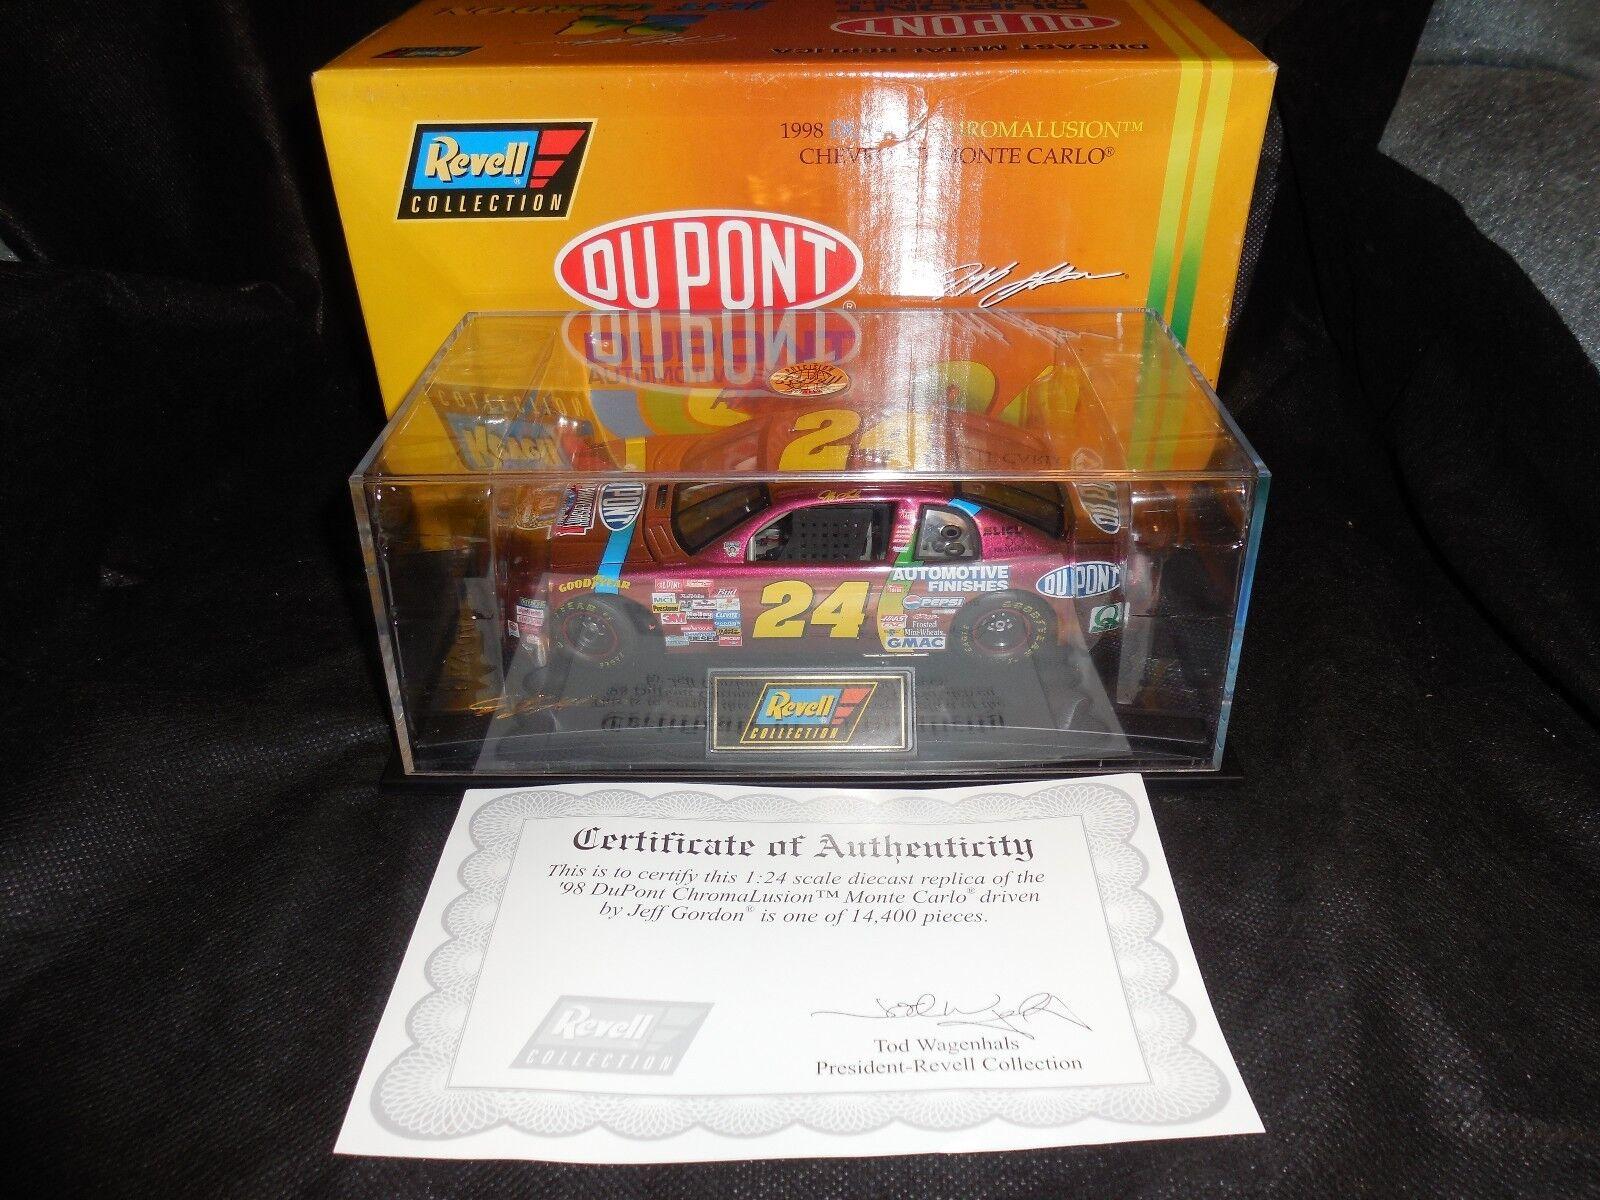 Revell Collection1 24 Jeff Gordon  24 Dupont Chromalusion 1998 Chevy Monte Carlo